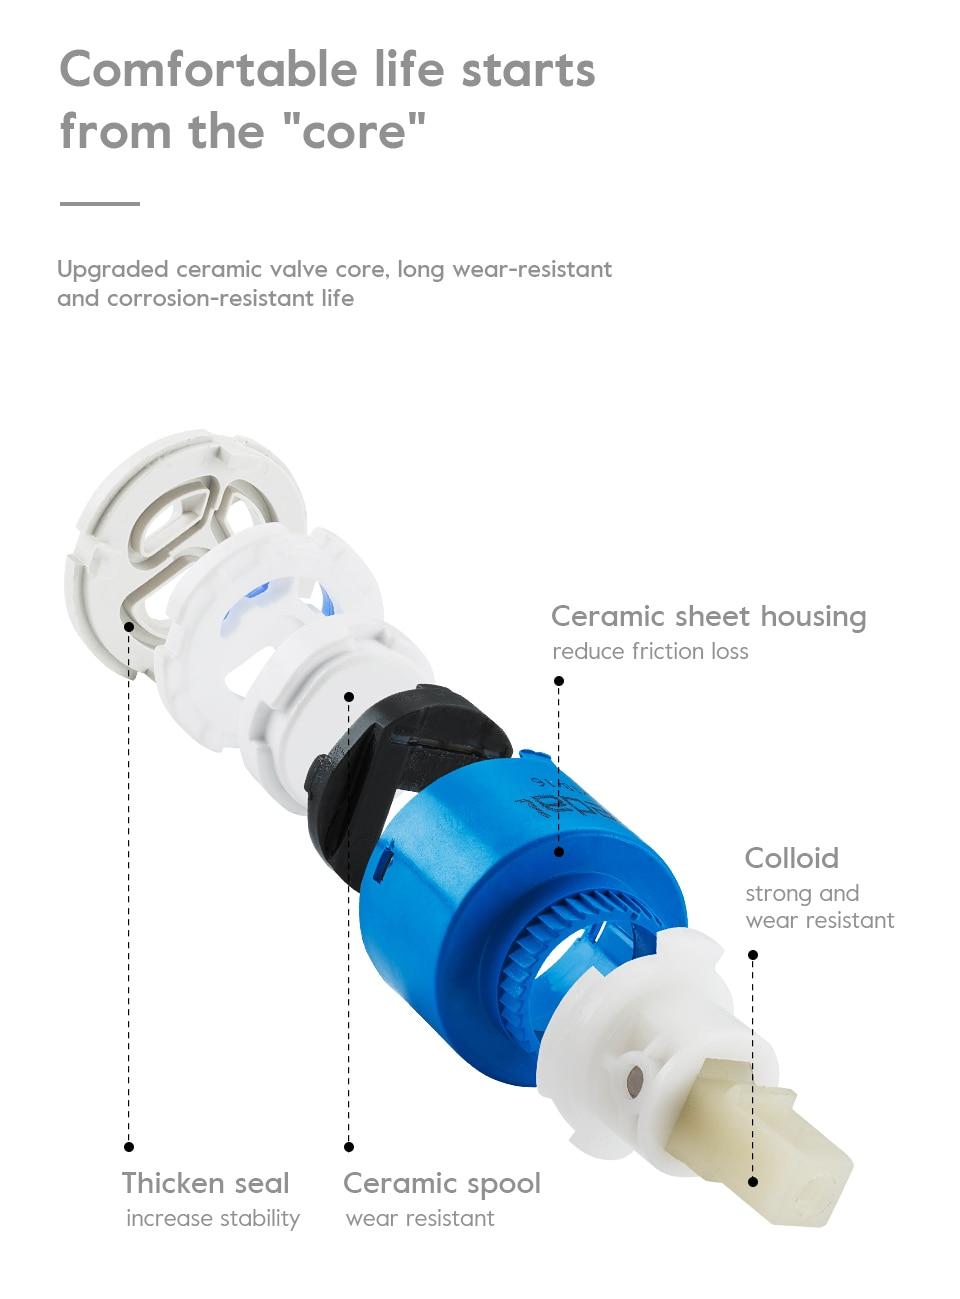 H3989dcf740064bd2a8af9c76ff4e6cb54 GAPPO water filter taps kitchen faucet mixer kitchen taps mixer sink faucets water purifier tap kitchen mixer filter tap